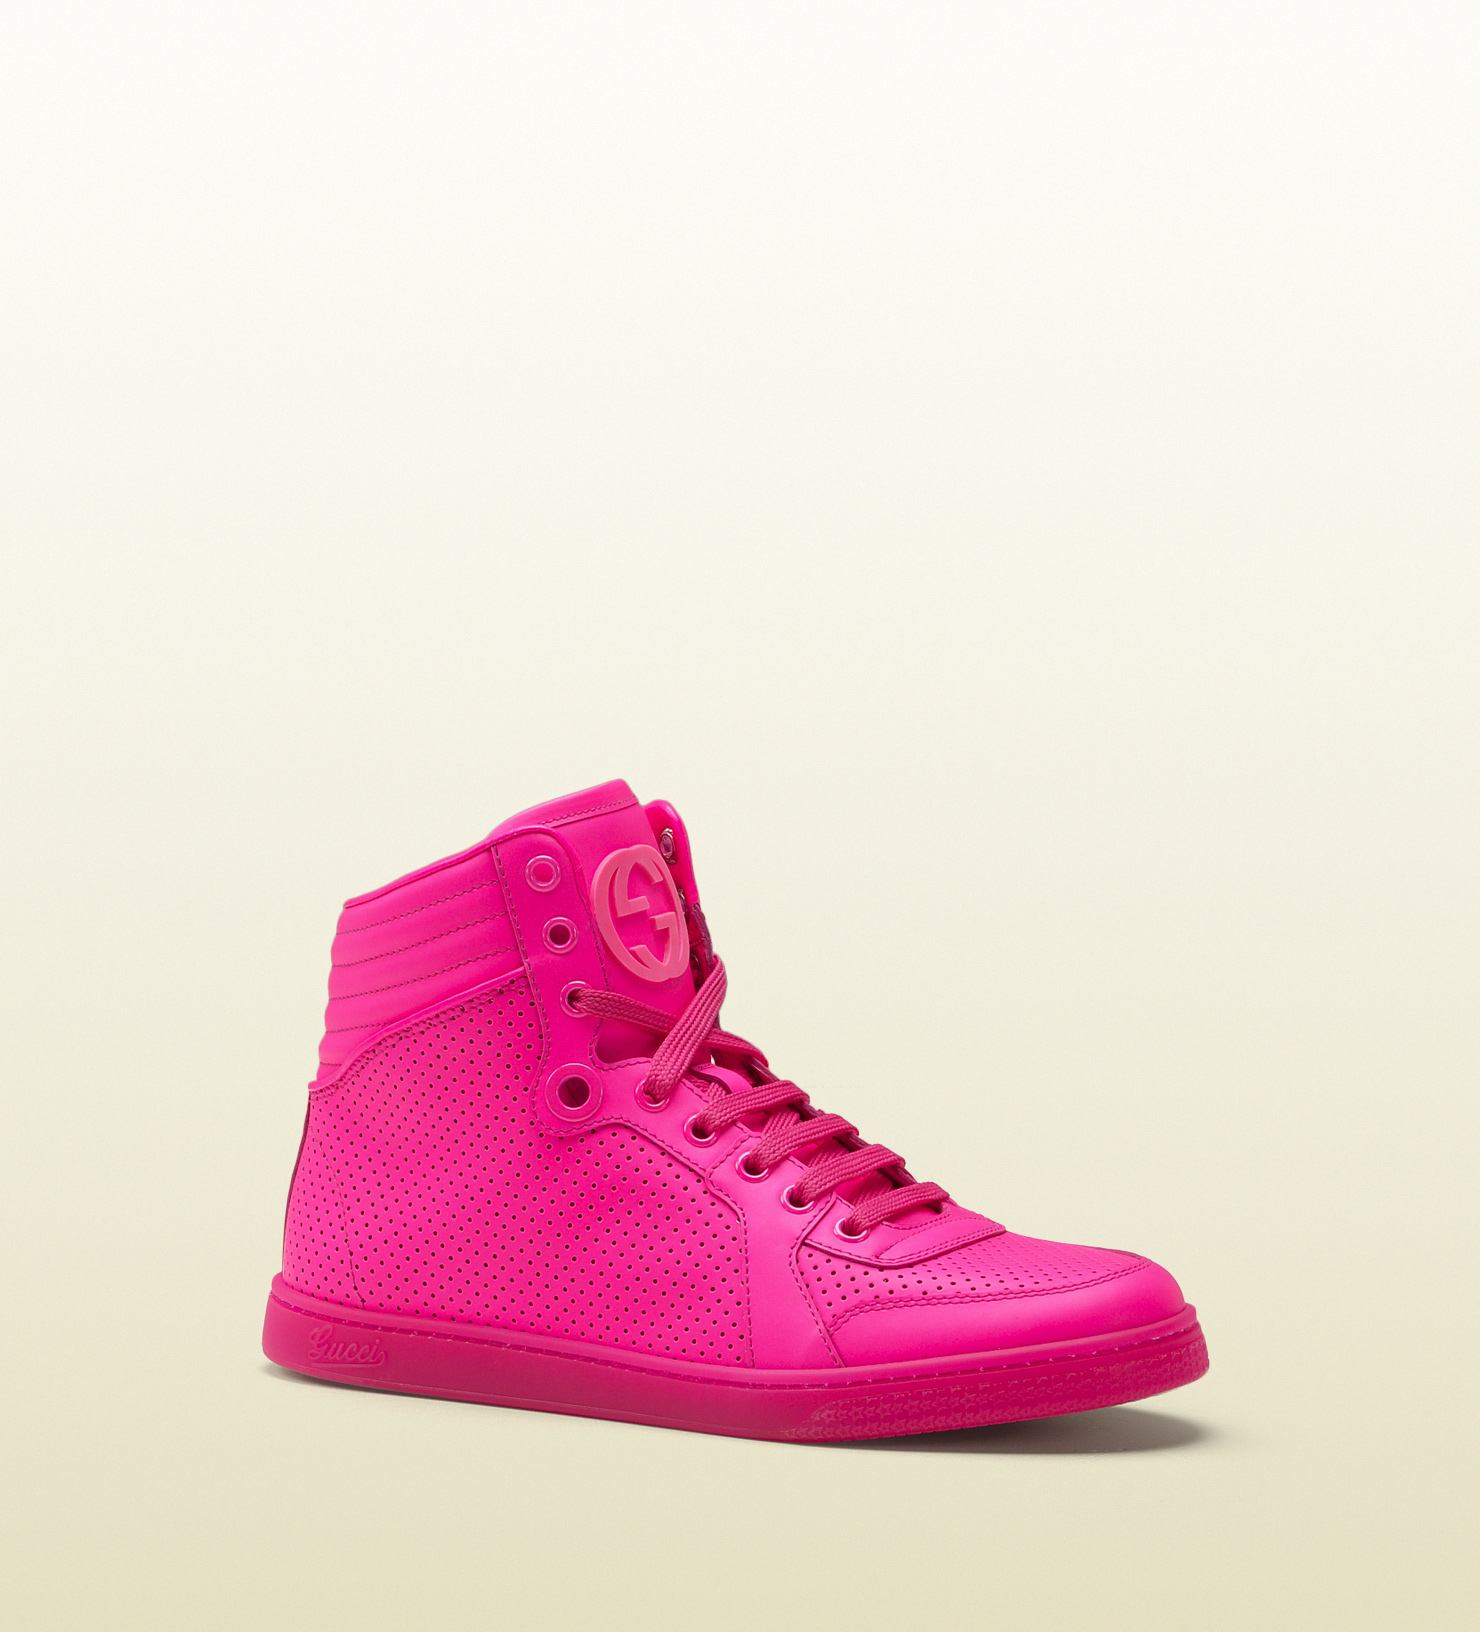 Gucci Schoenen Pink